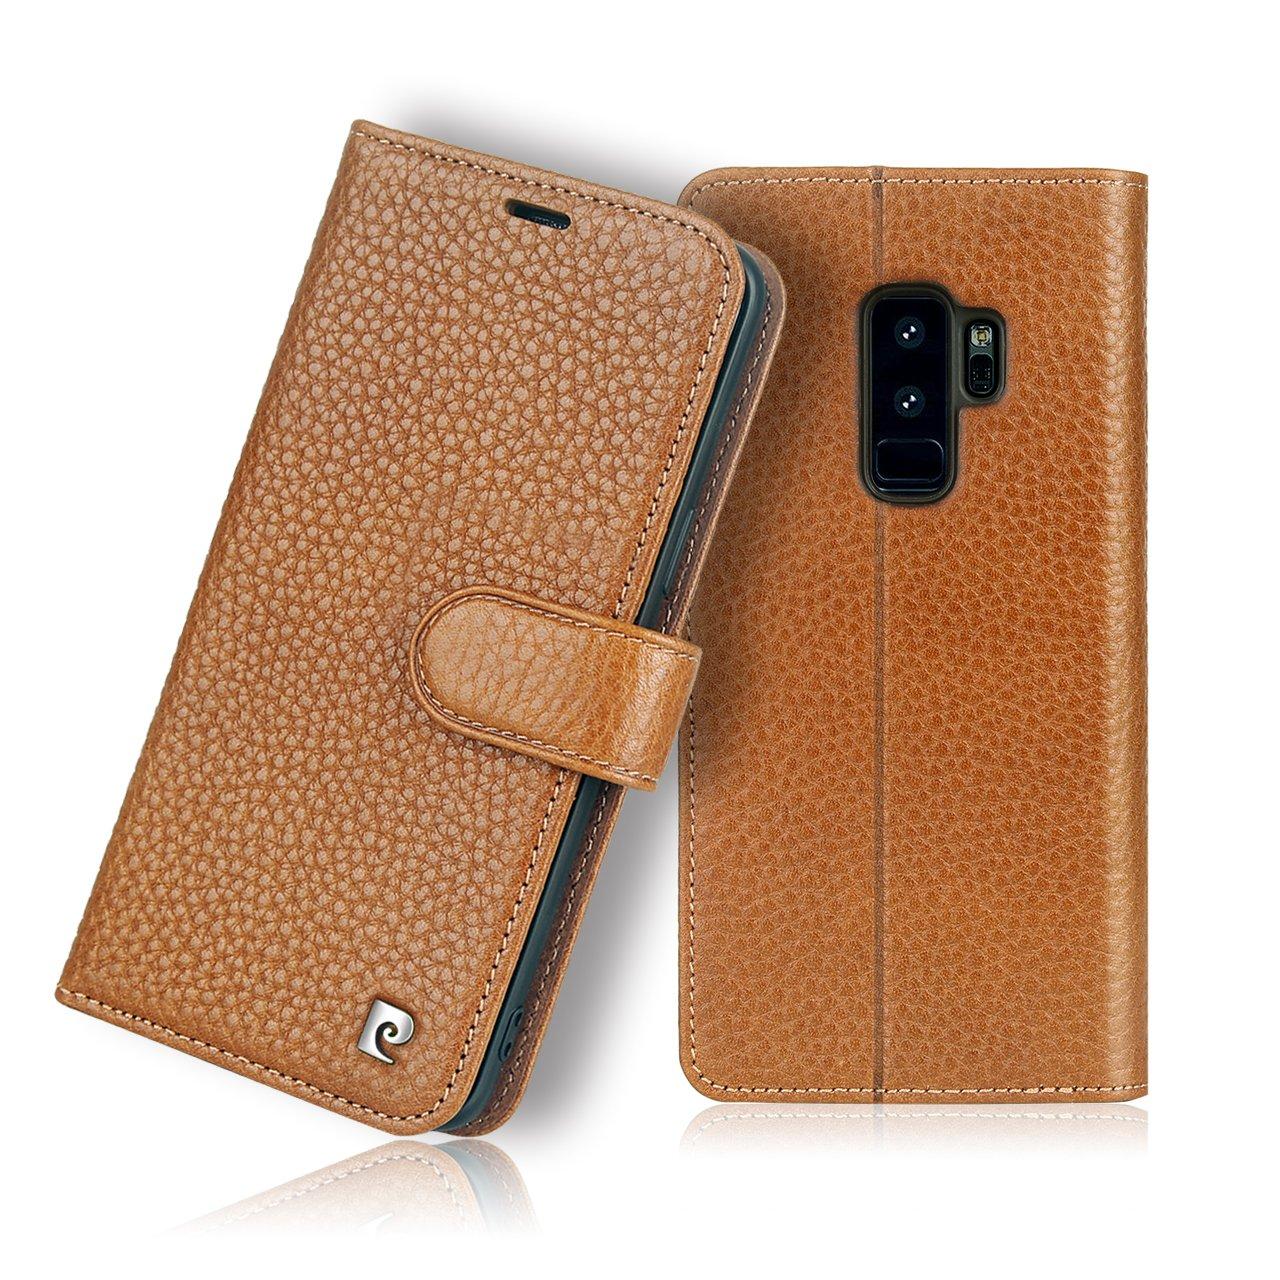 Pierre Cardin Wallet Case Premium Genuine Leather Folio Cover with Credit Card Flip Money Cash Kickstand Detachable Design Slots for Samsung Galaxy S9+/S9 Plus (Brown)